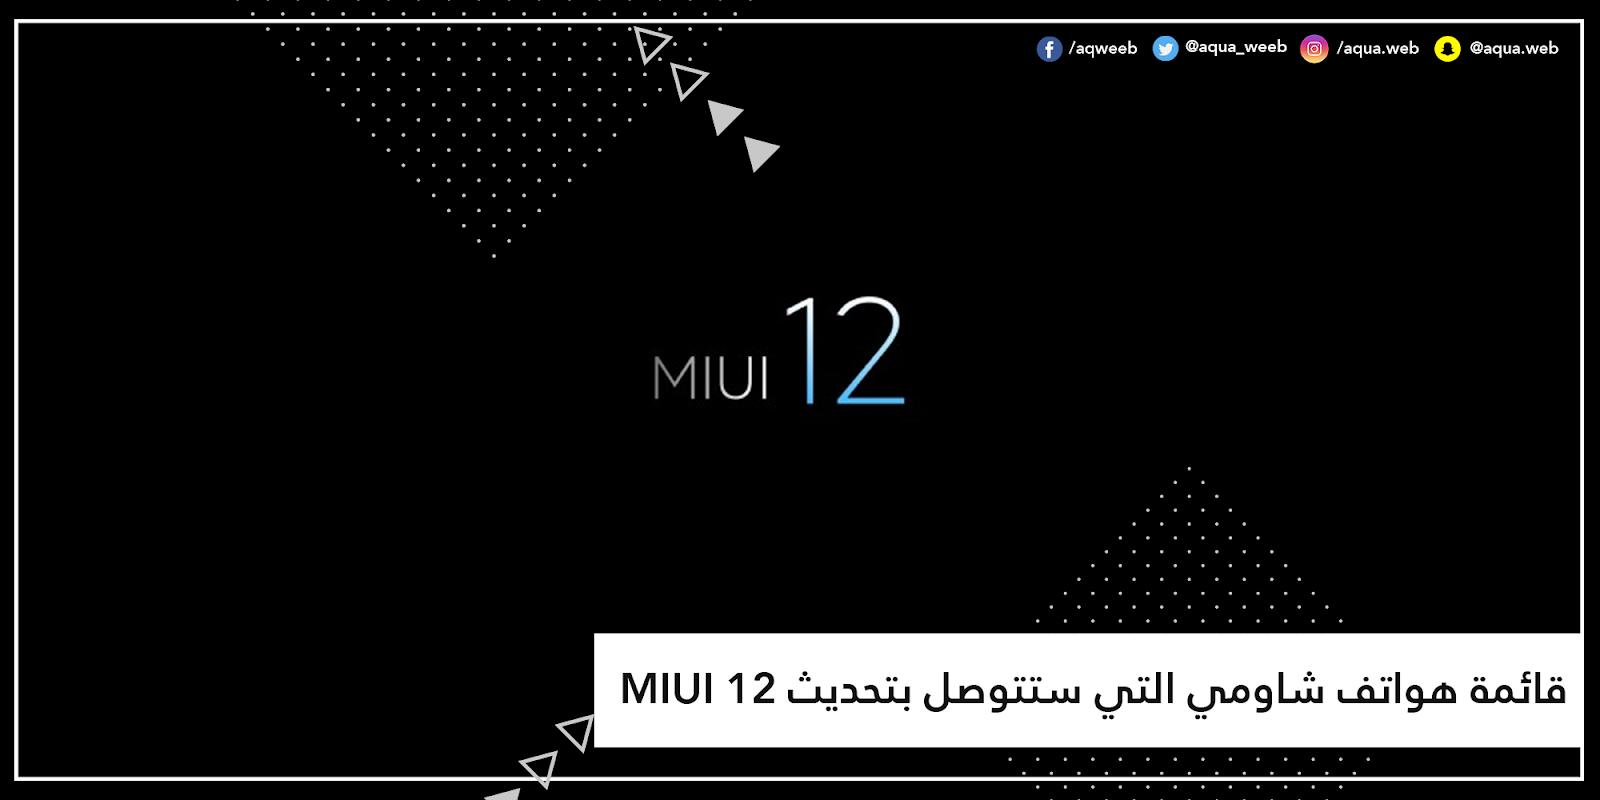 قائمة هواتف شاومي التي ستتوصل بتحديث MIUI 12